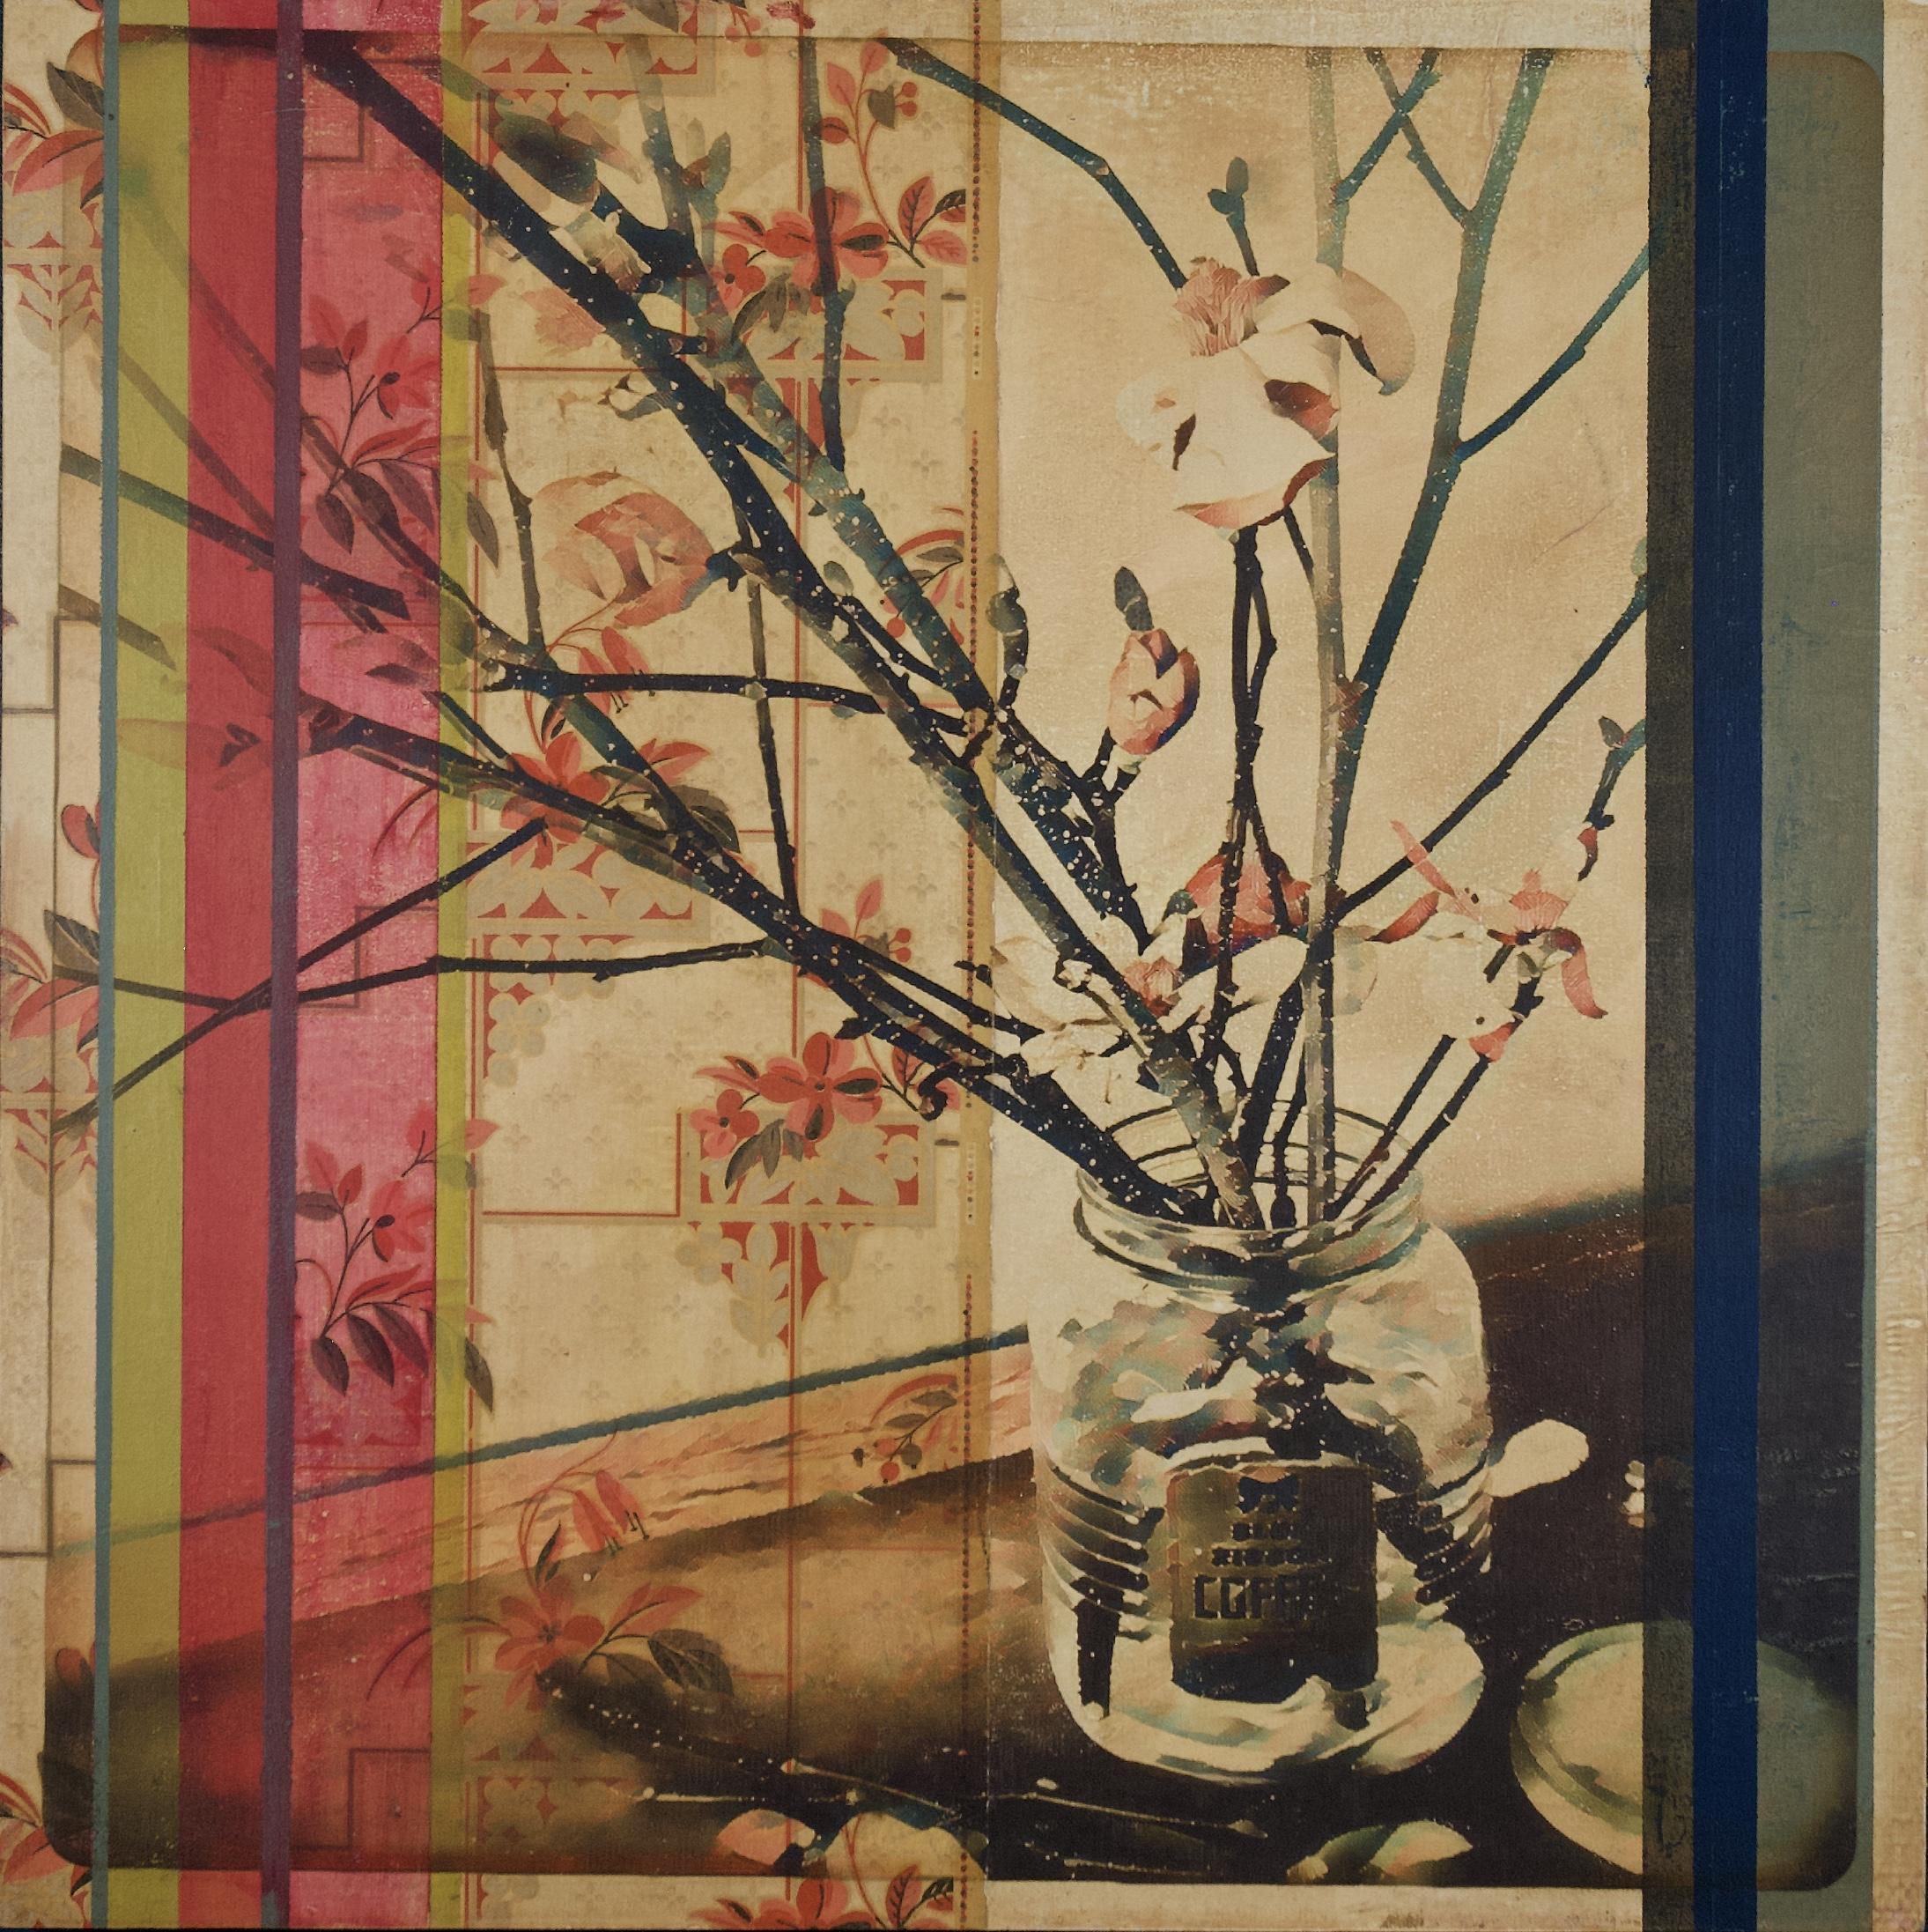 Still Life with Magnolia Branch